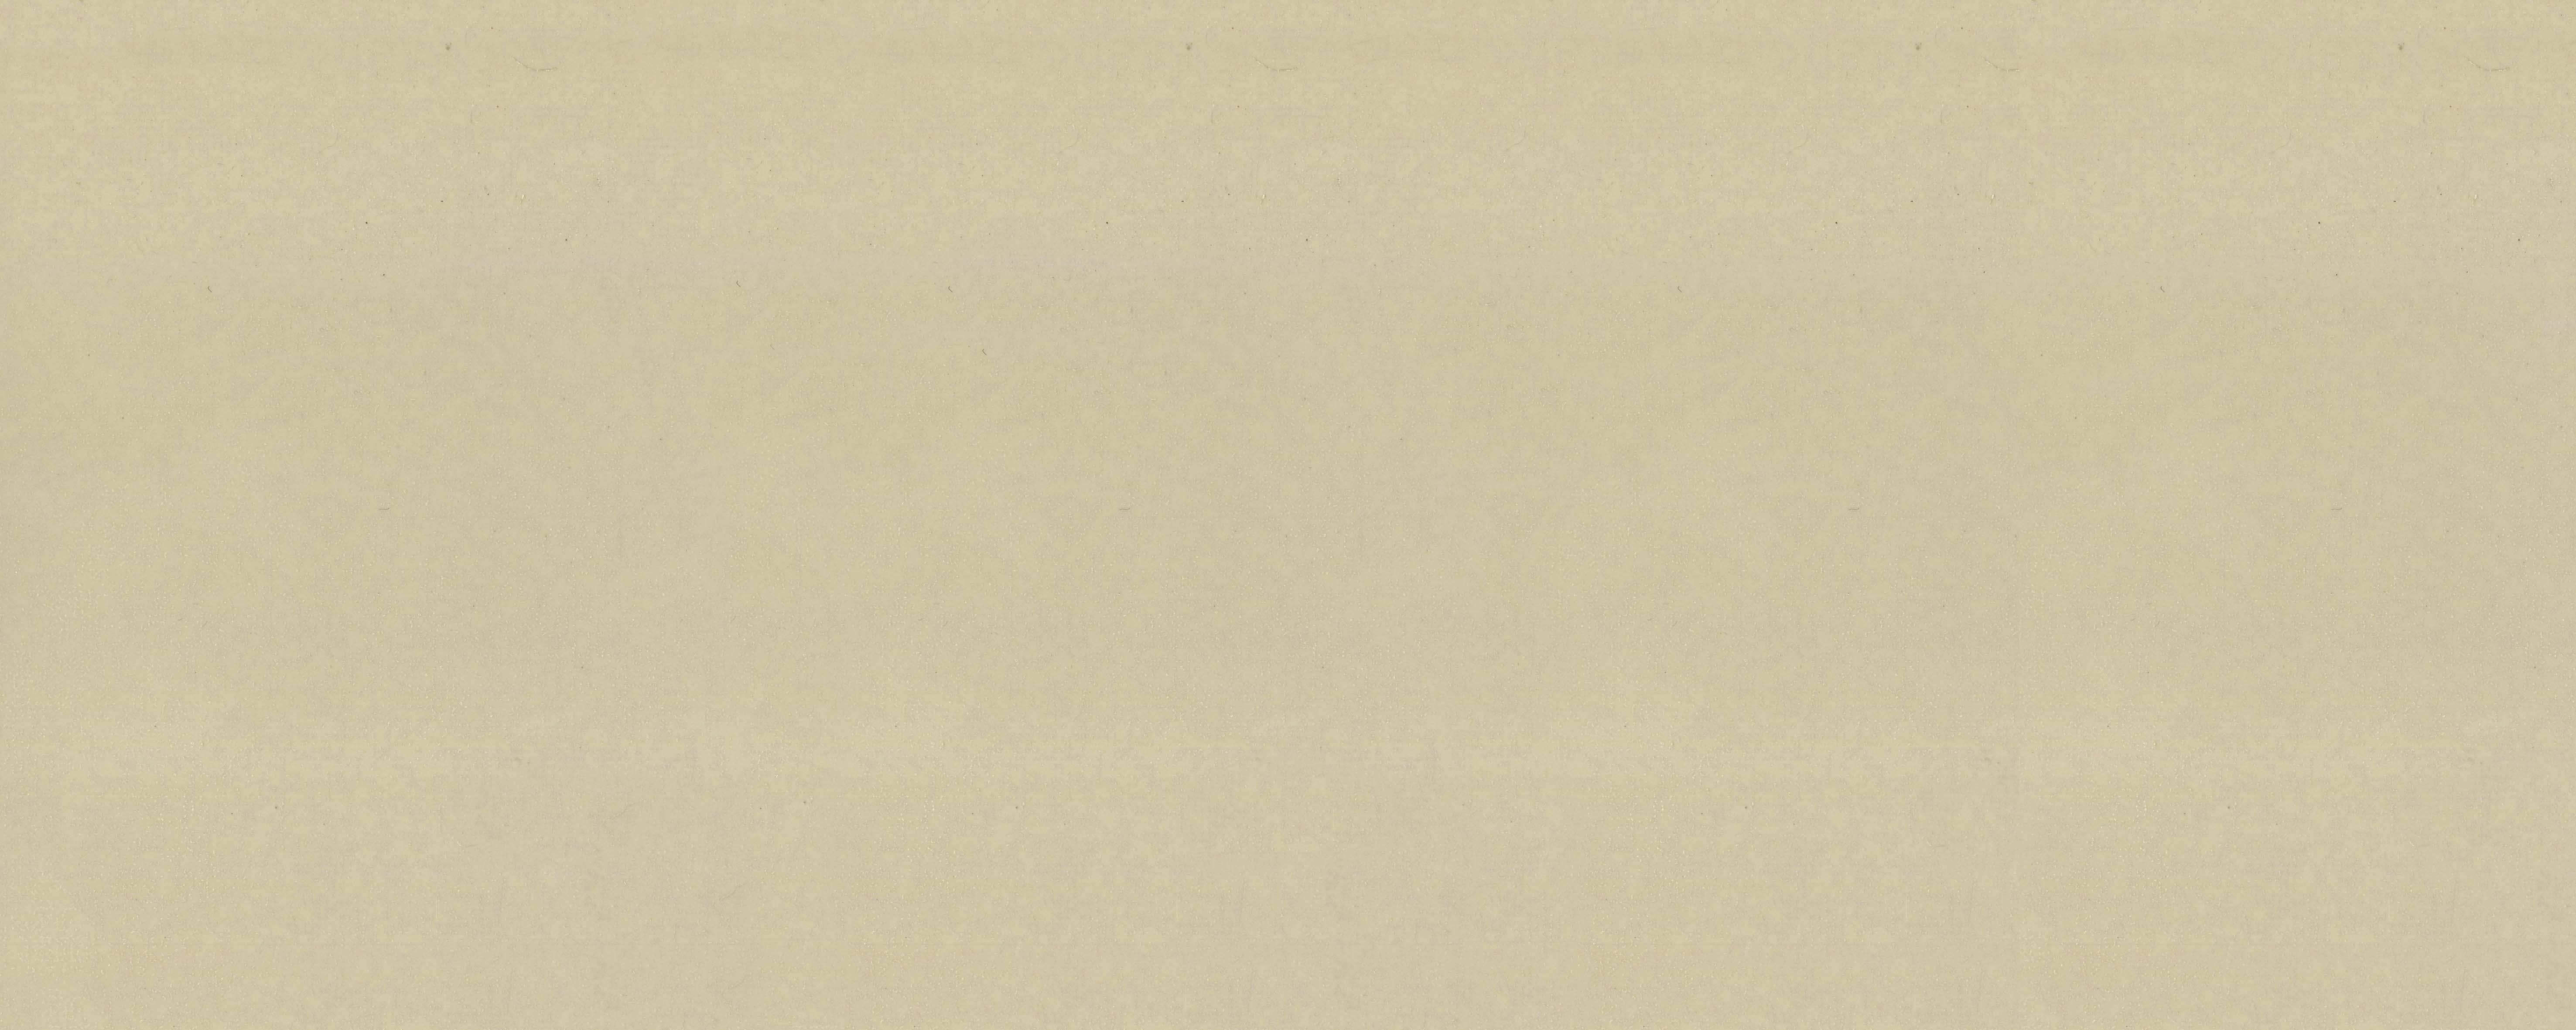 34 Mystic beige  20x50 - Hansas Plaadimaailm